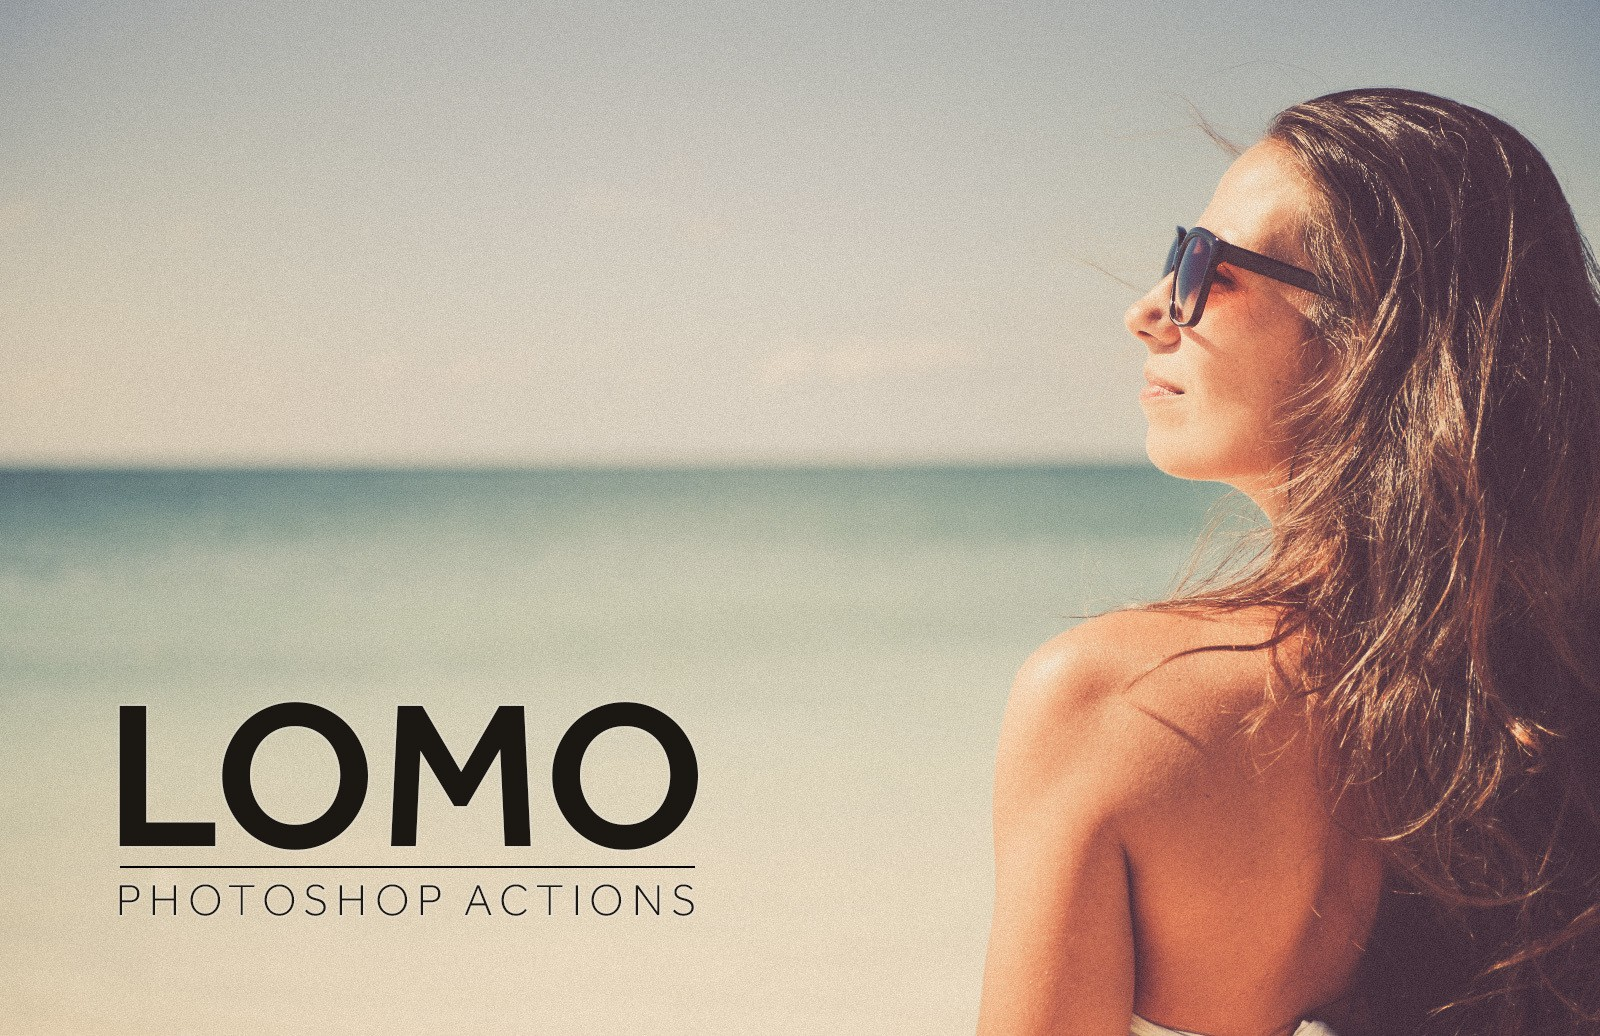 Lomo Photoshop Action 2